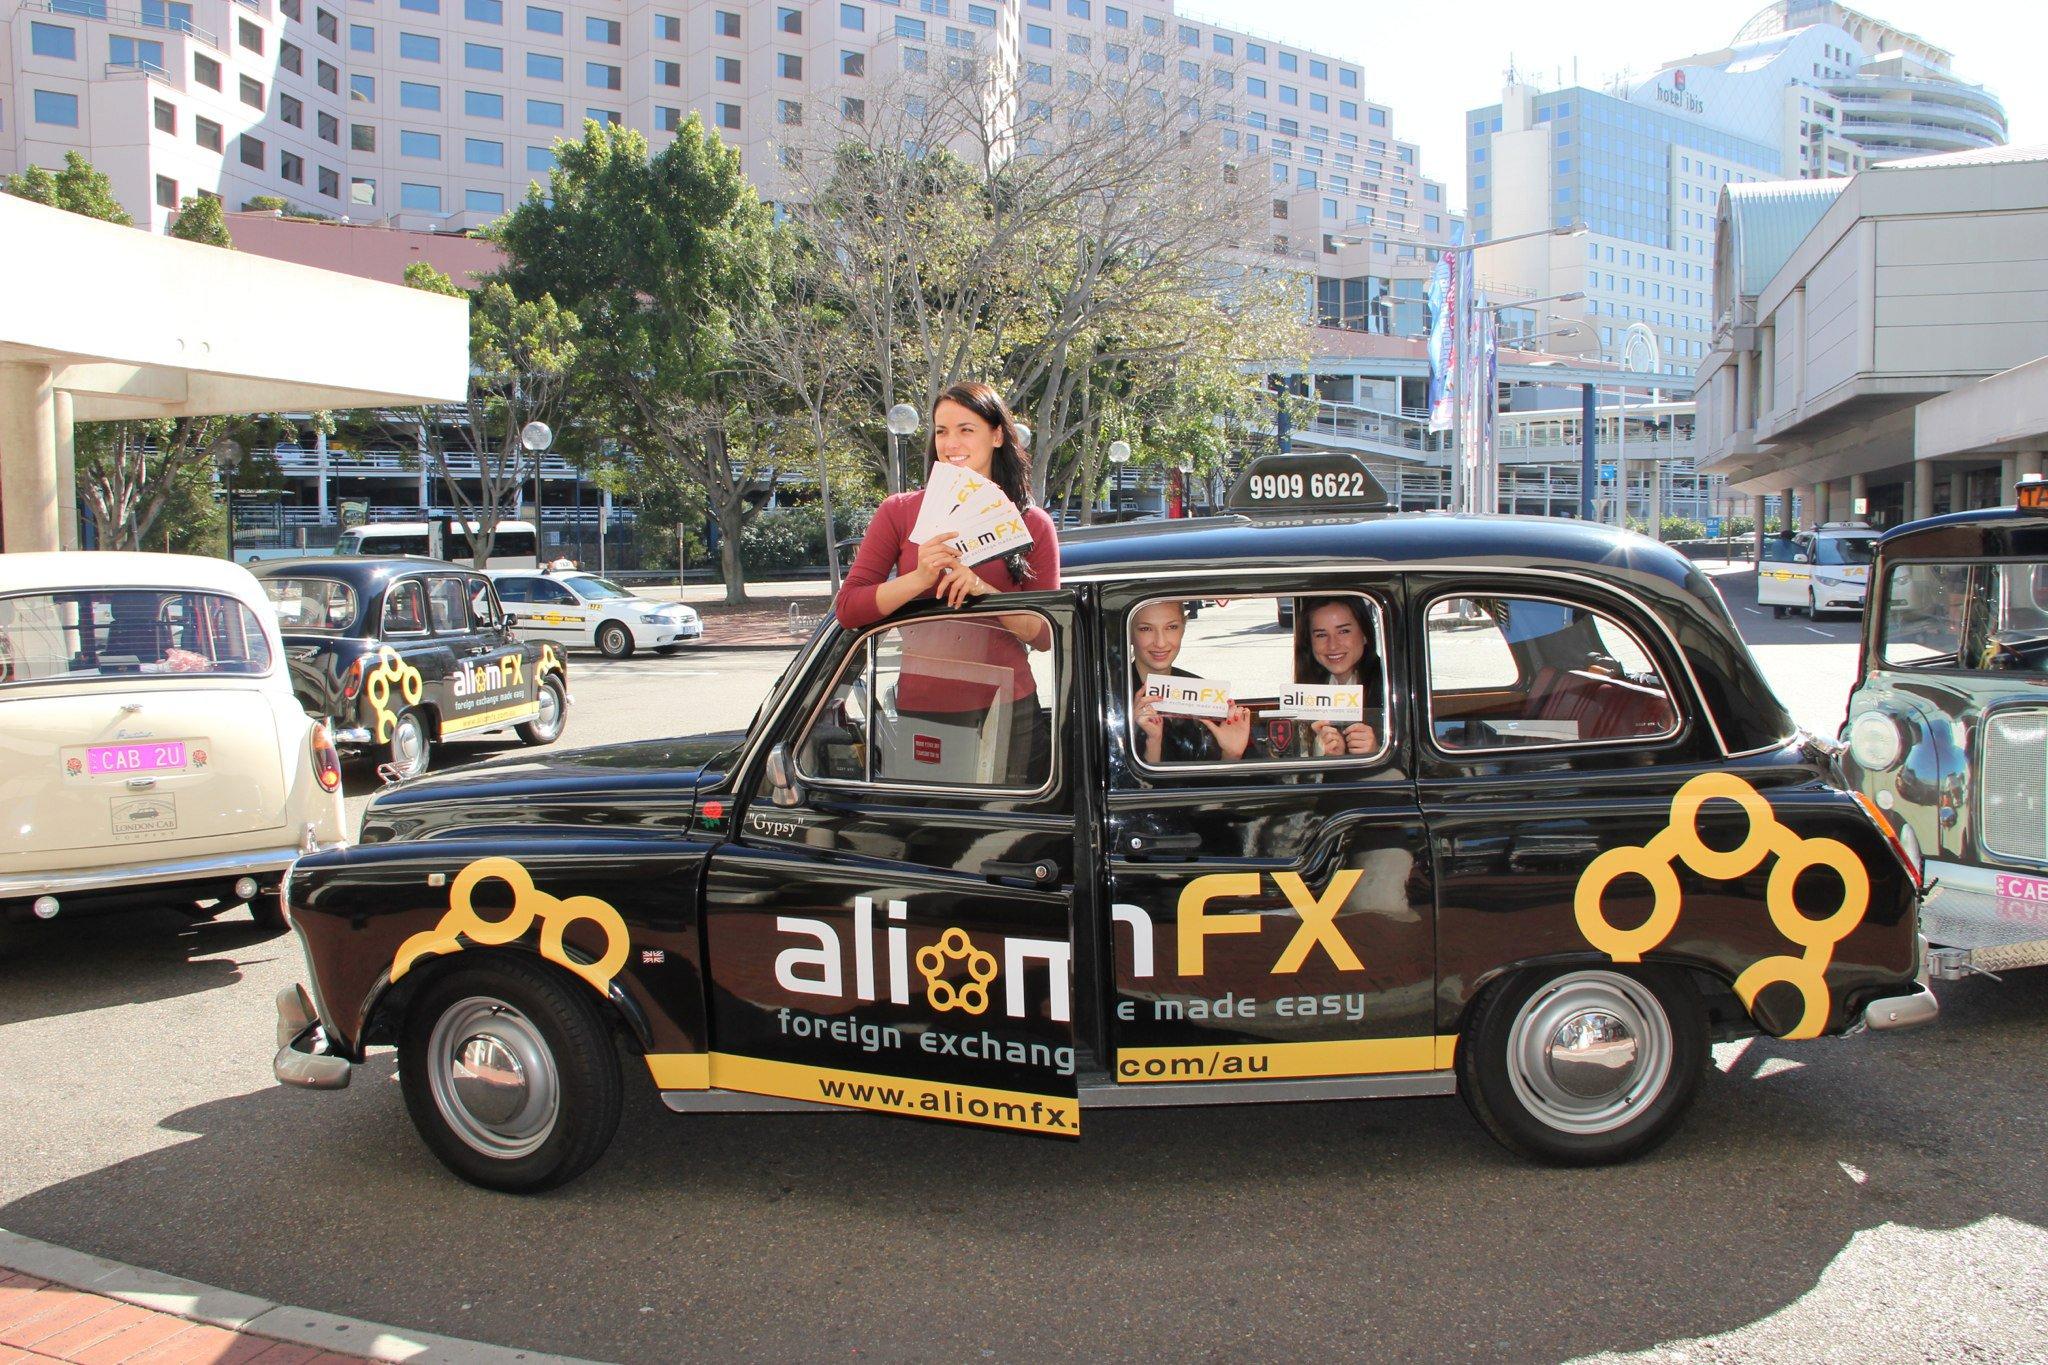 ALIOM FX - 'Fpreign Exchange Made Easy' Branding Cam[paign